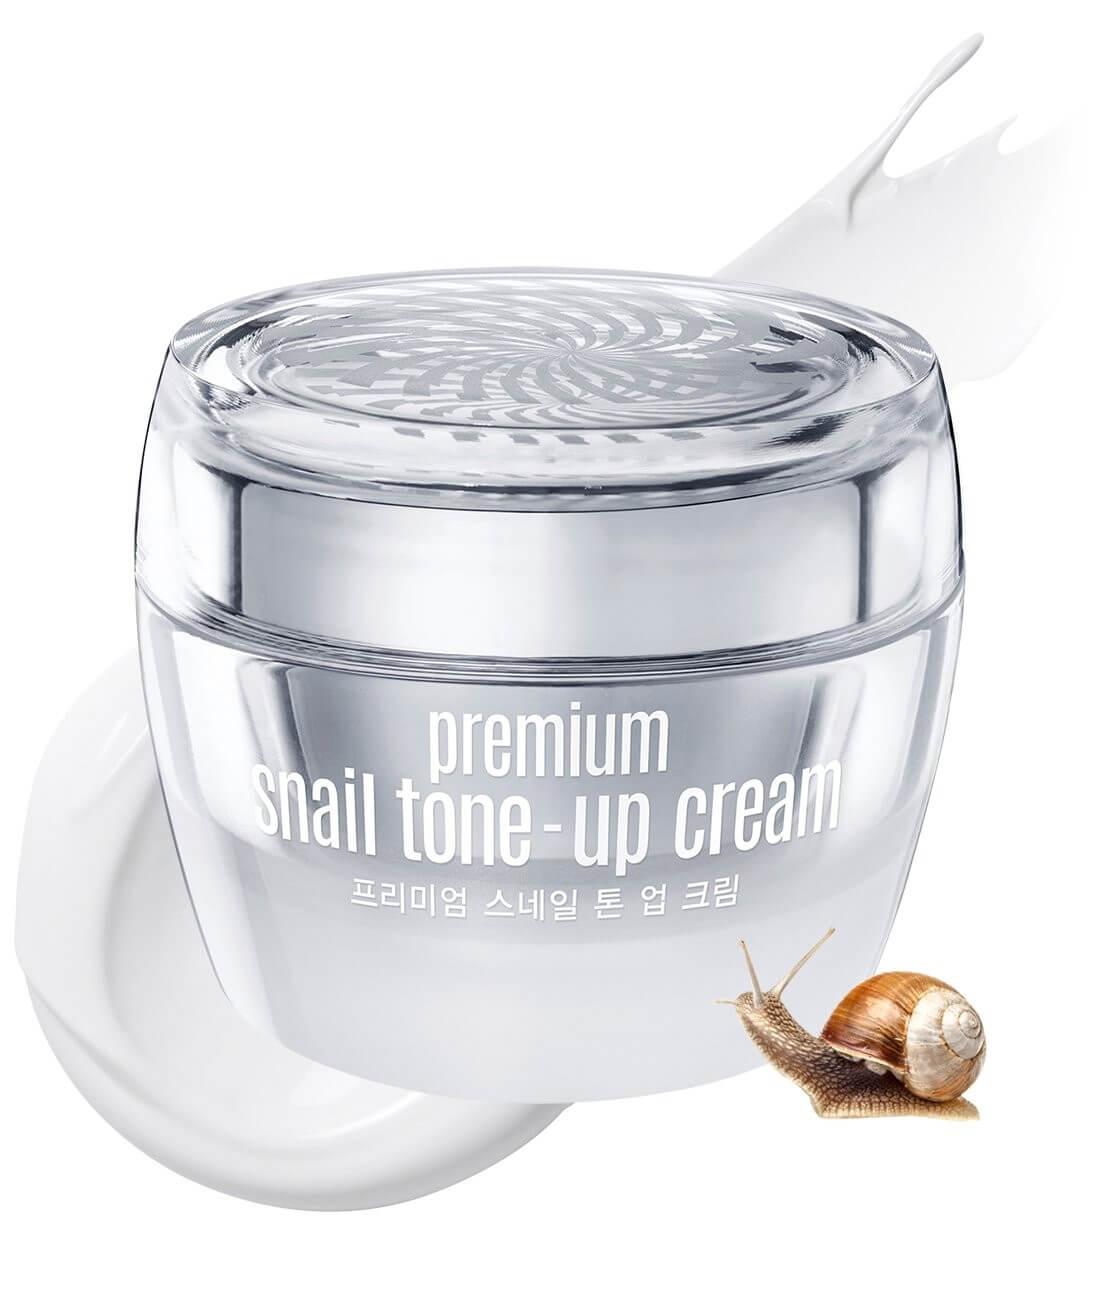 Kem ốc sên Premium Snail Tone Up Cream